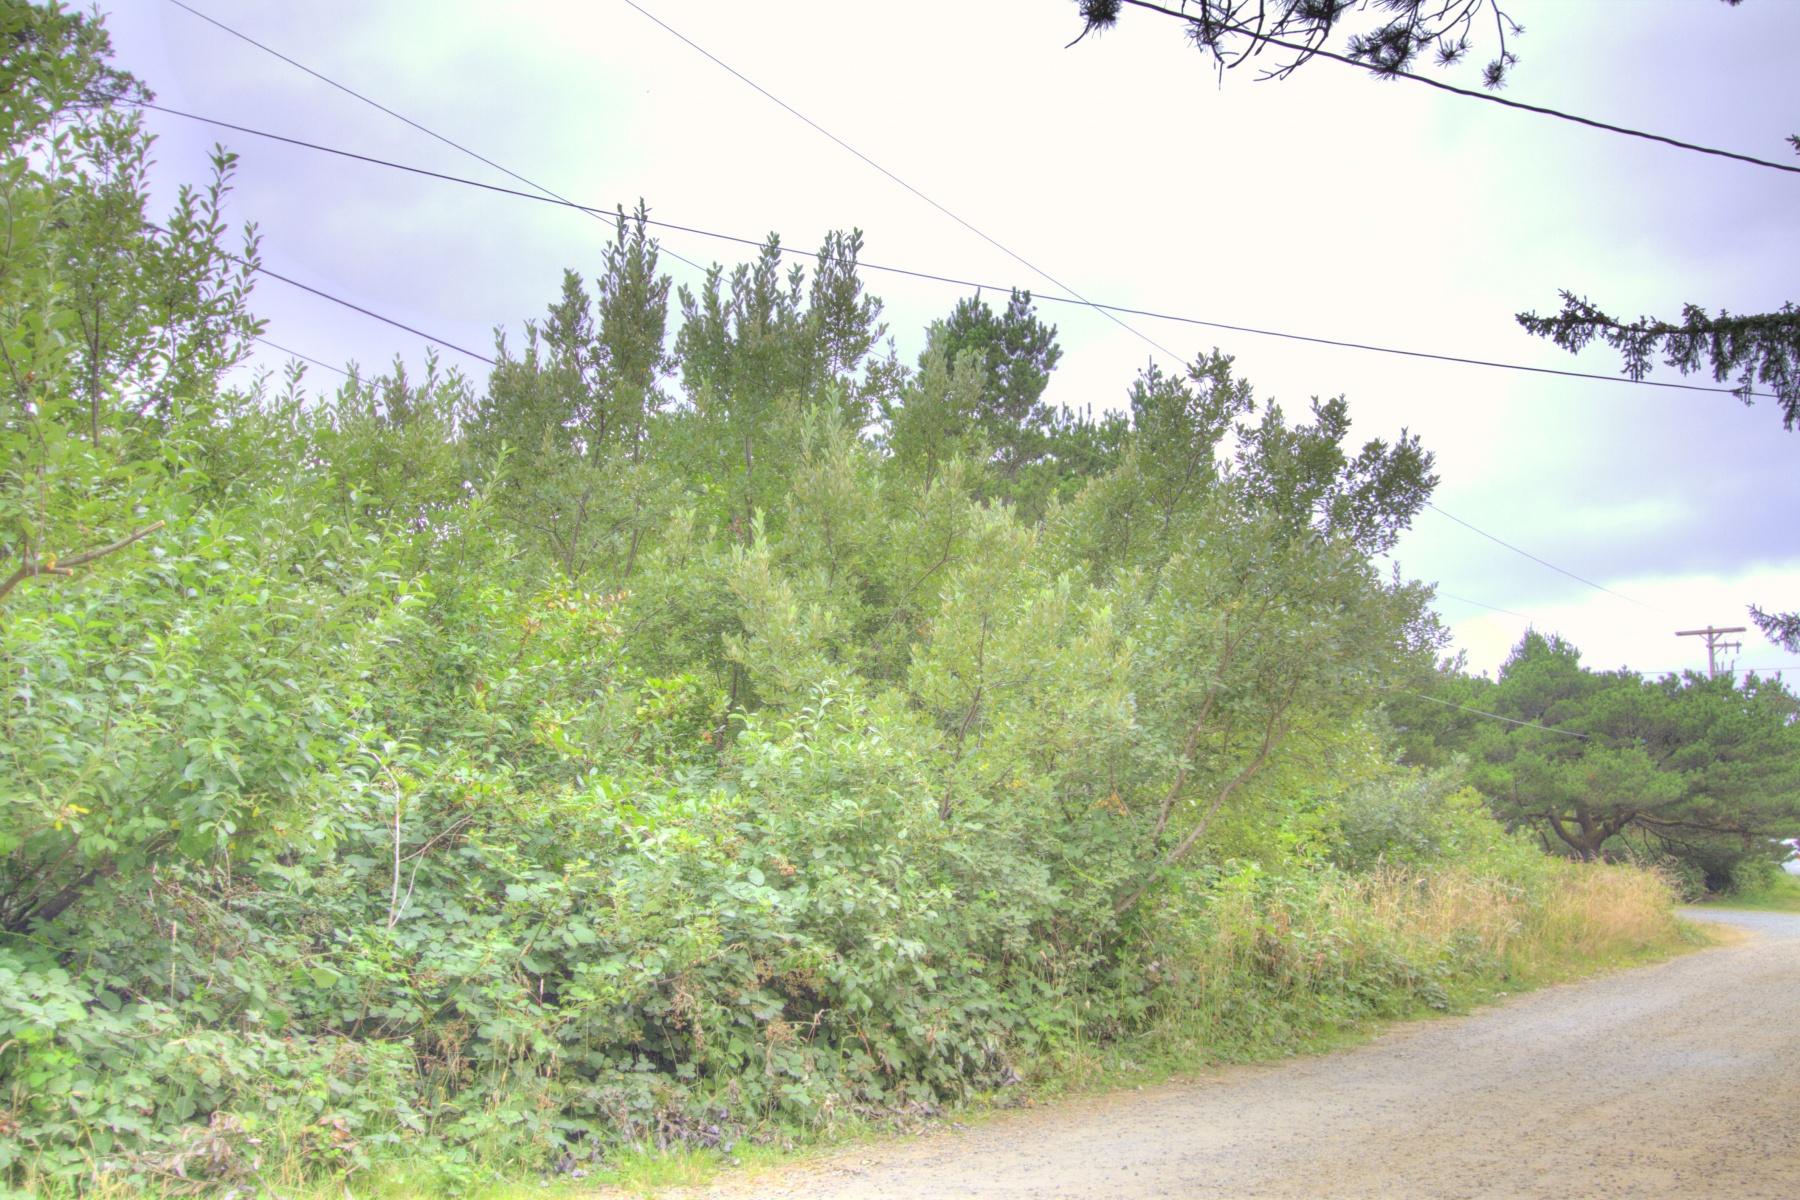 Land for Sale at Windward LN 101, MANZANITA Manzanita, Oregon, 97130 United States